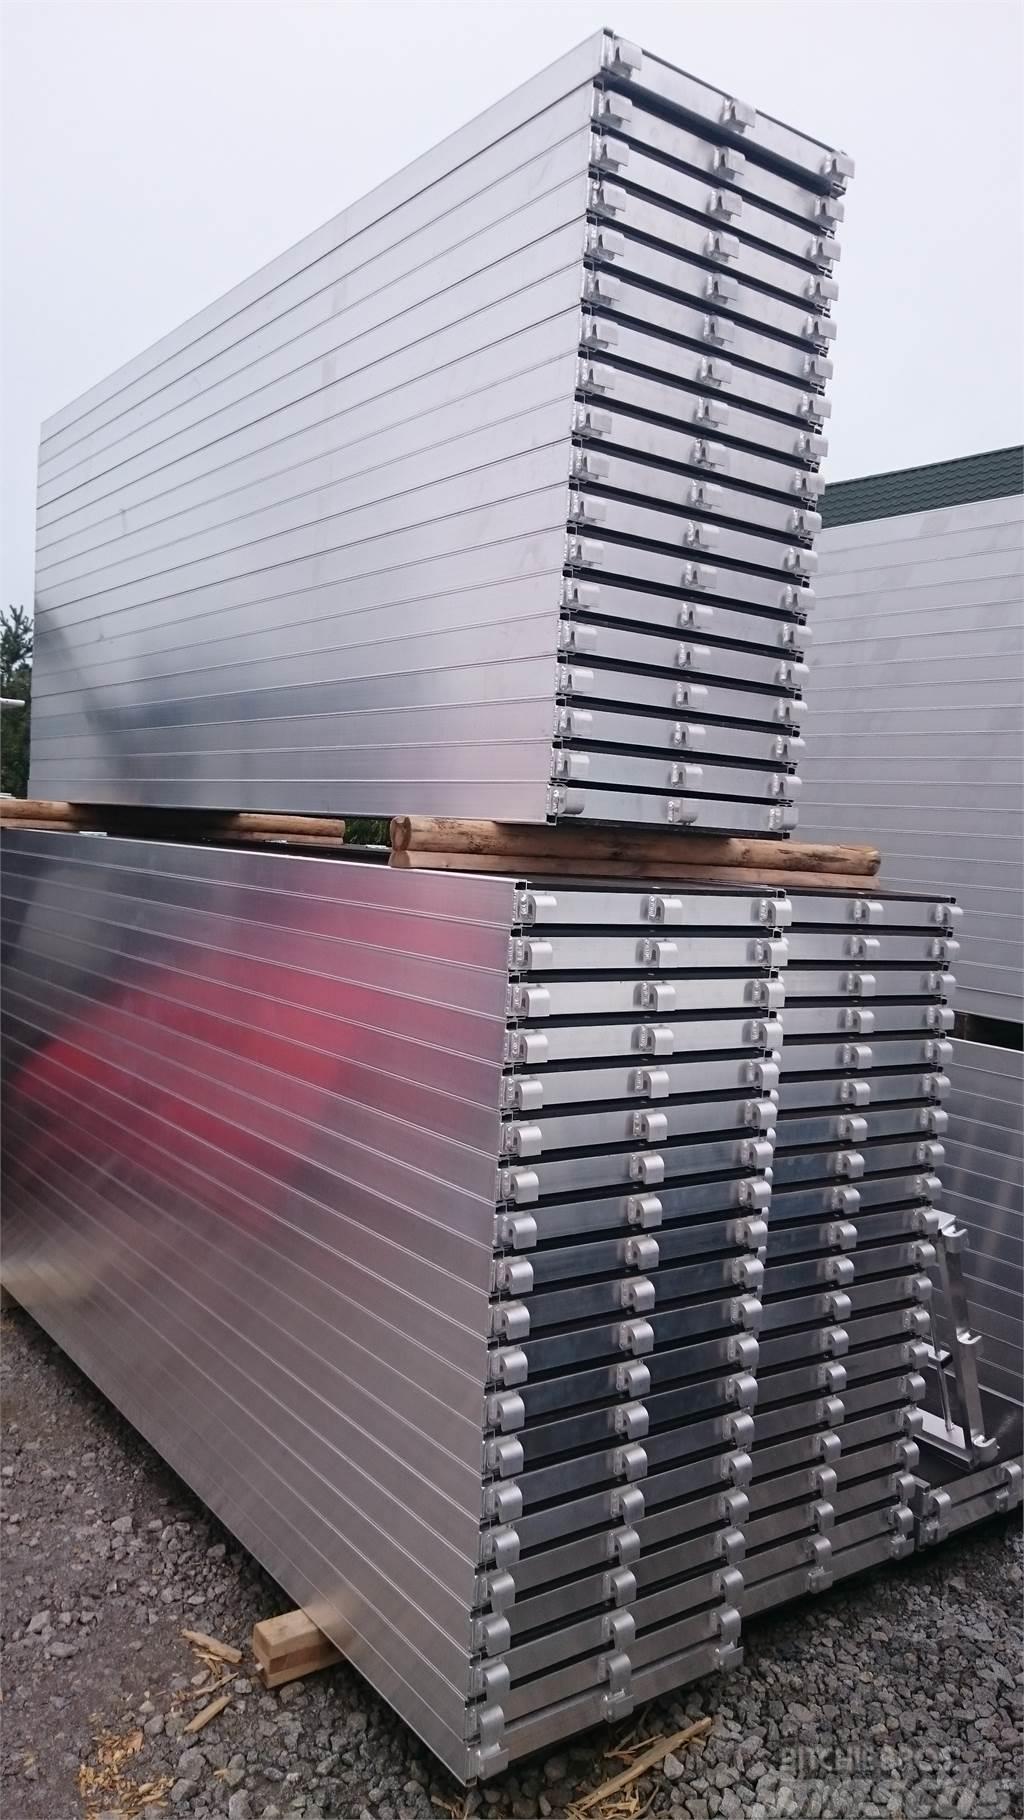 [Other] Podest stalowy,steel plank,plateforme en acier sta